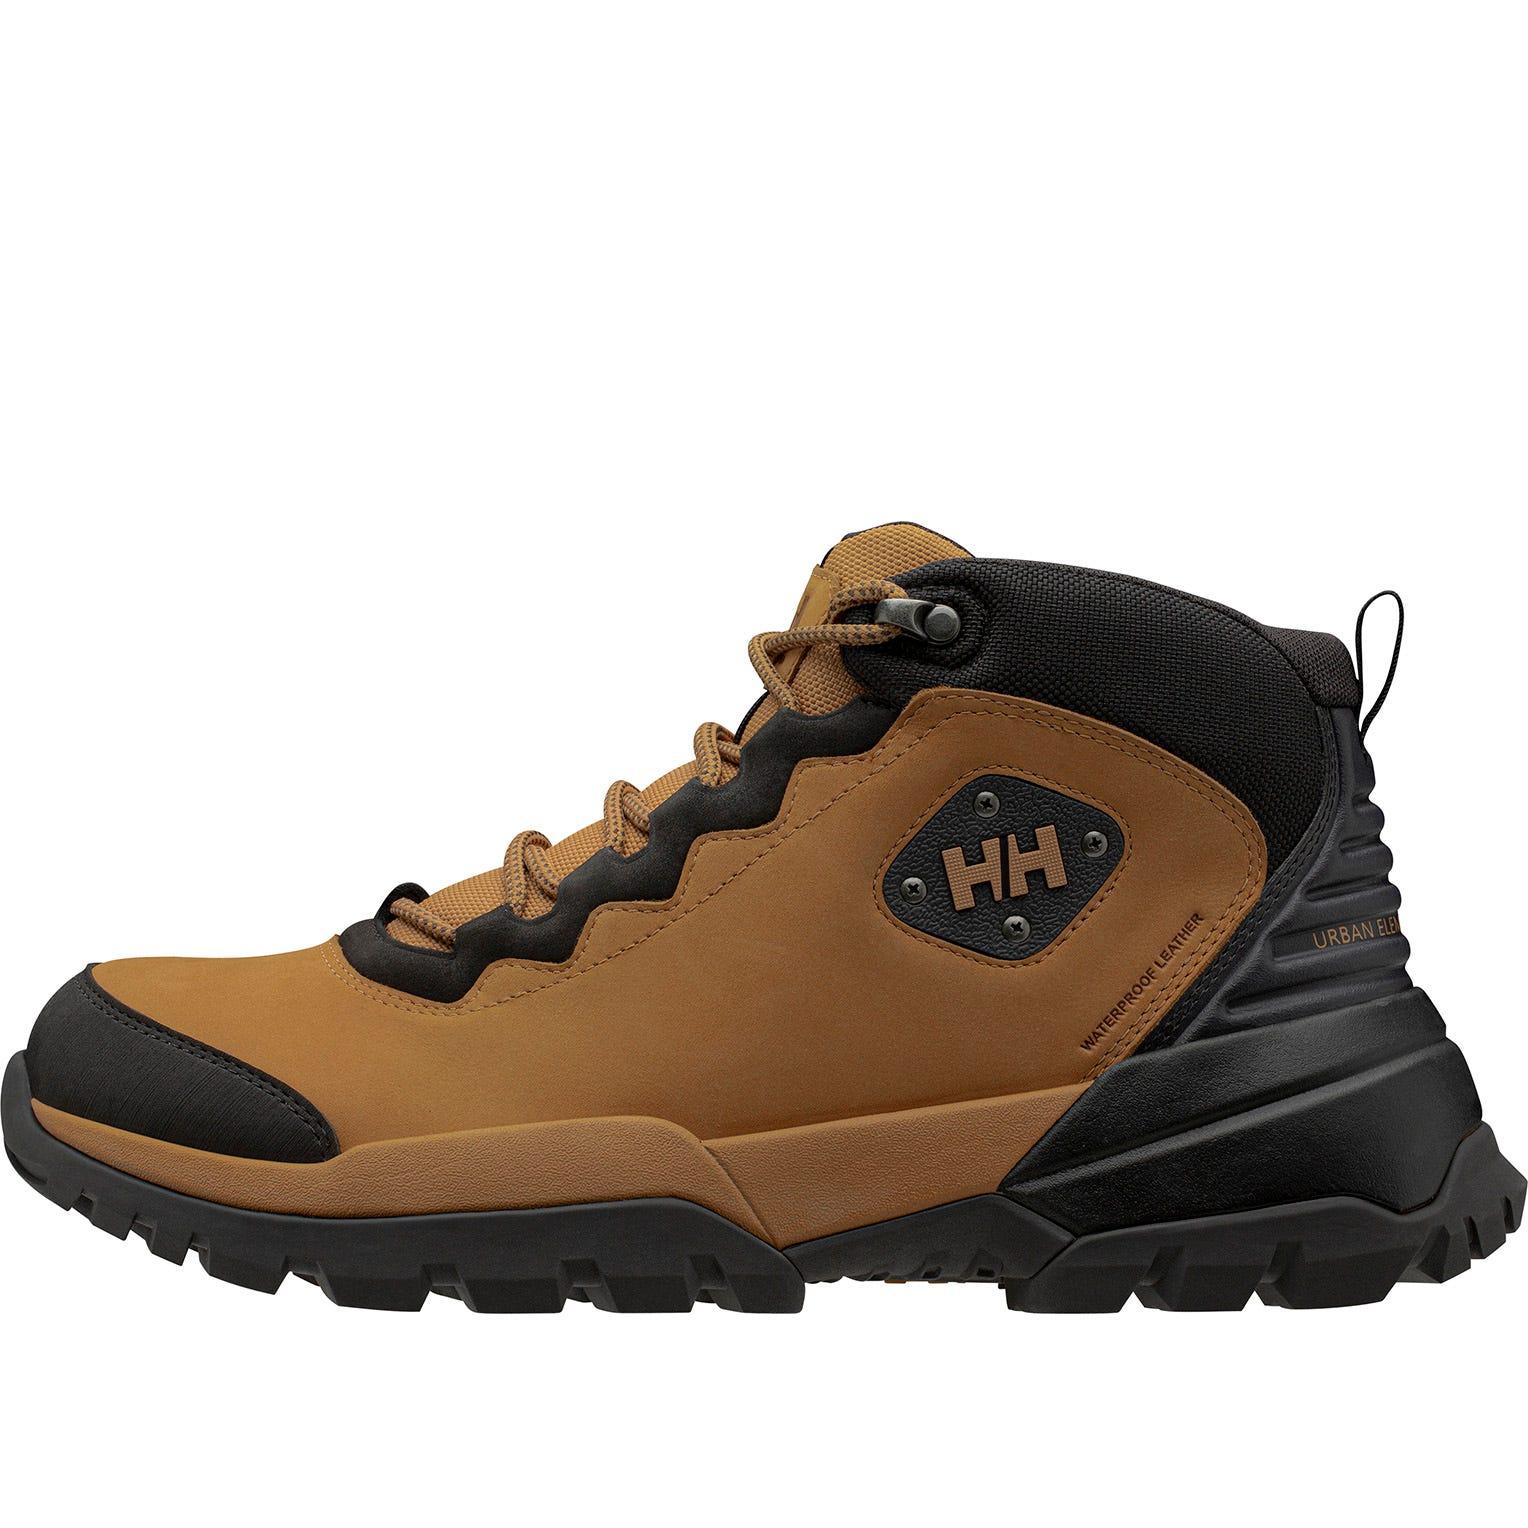 Helly Hansen Mens Knaster Evo 5 Casual Shoe Brown 9